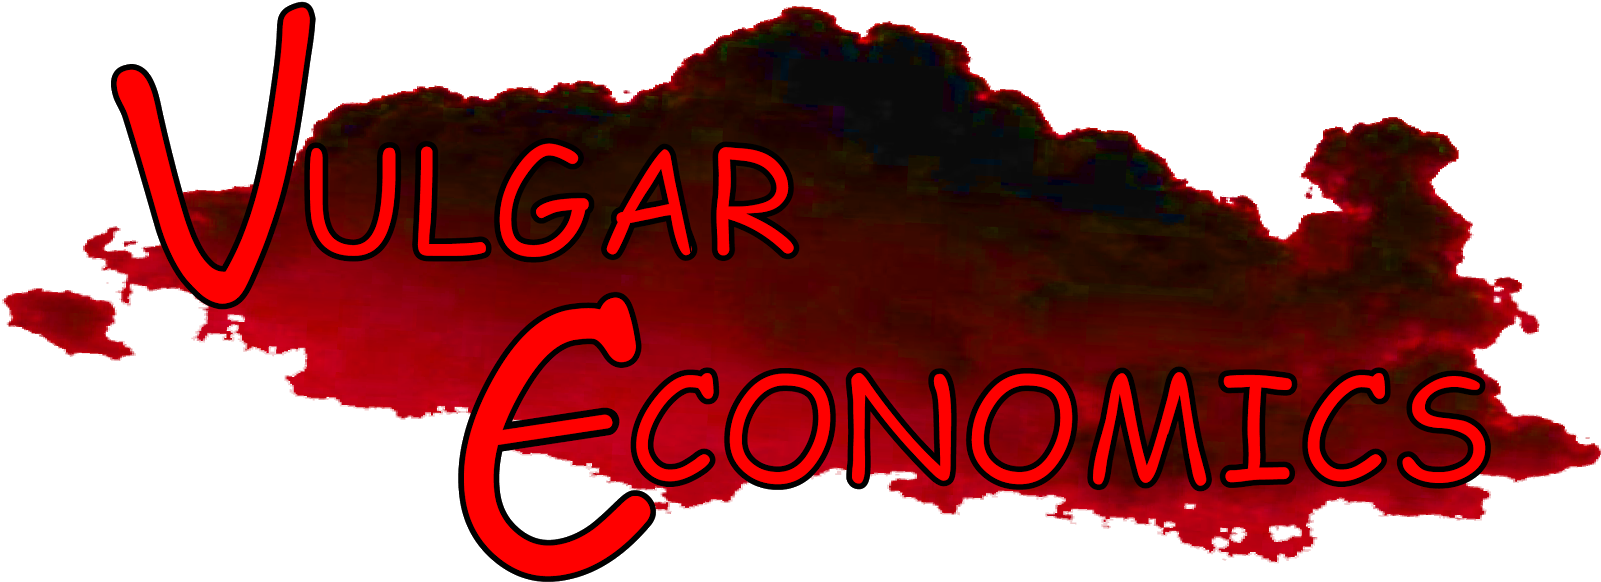 Vulgar Economics.